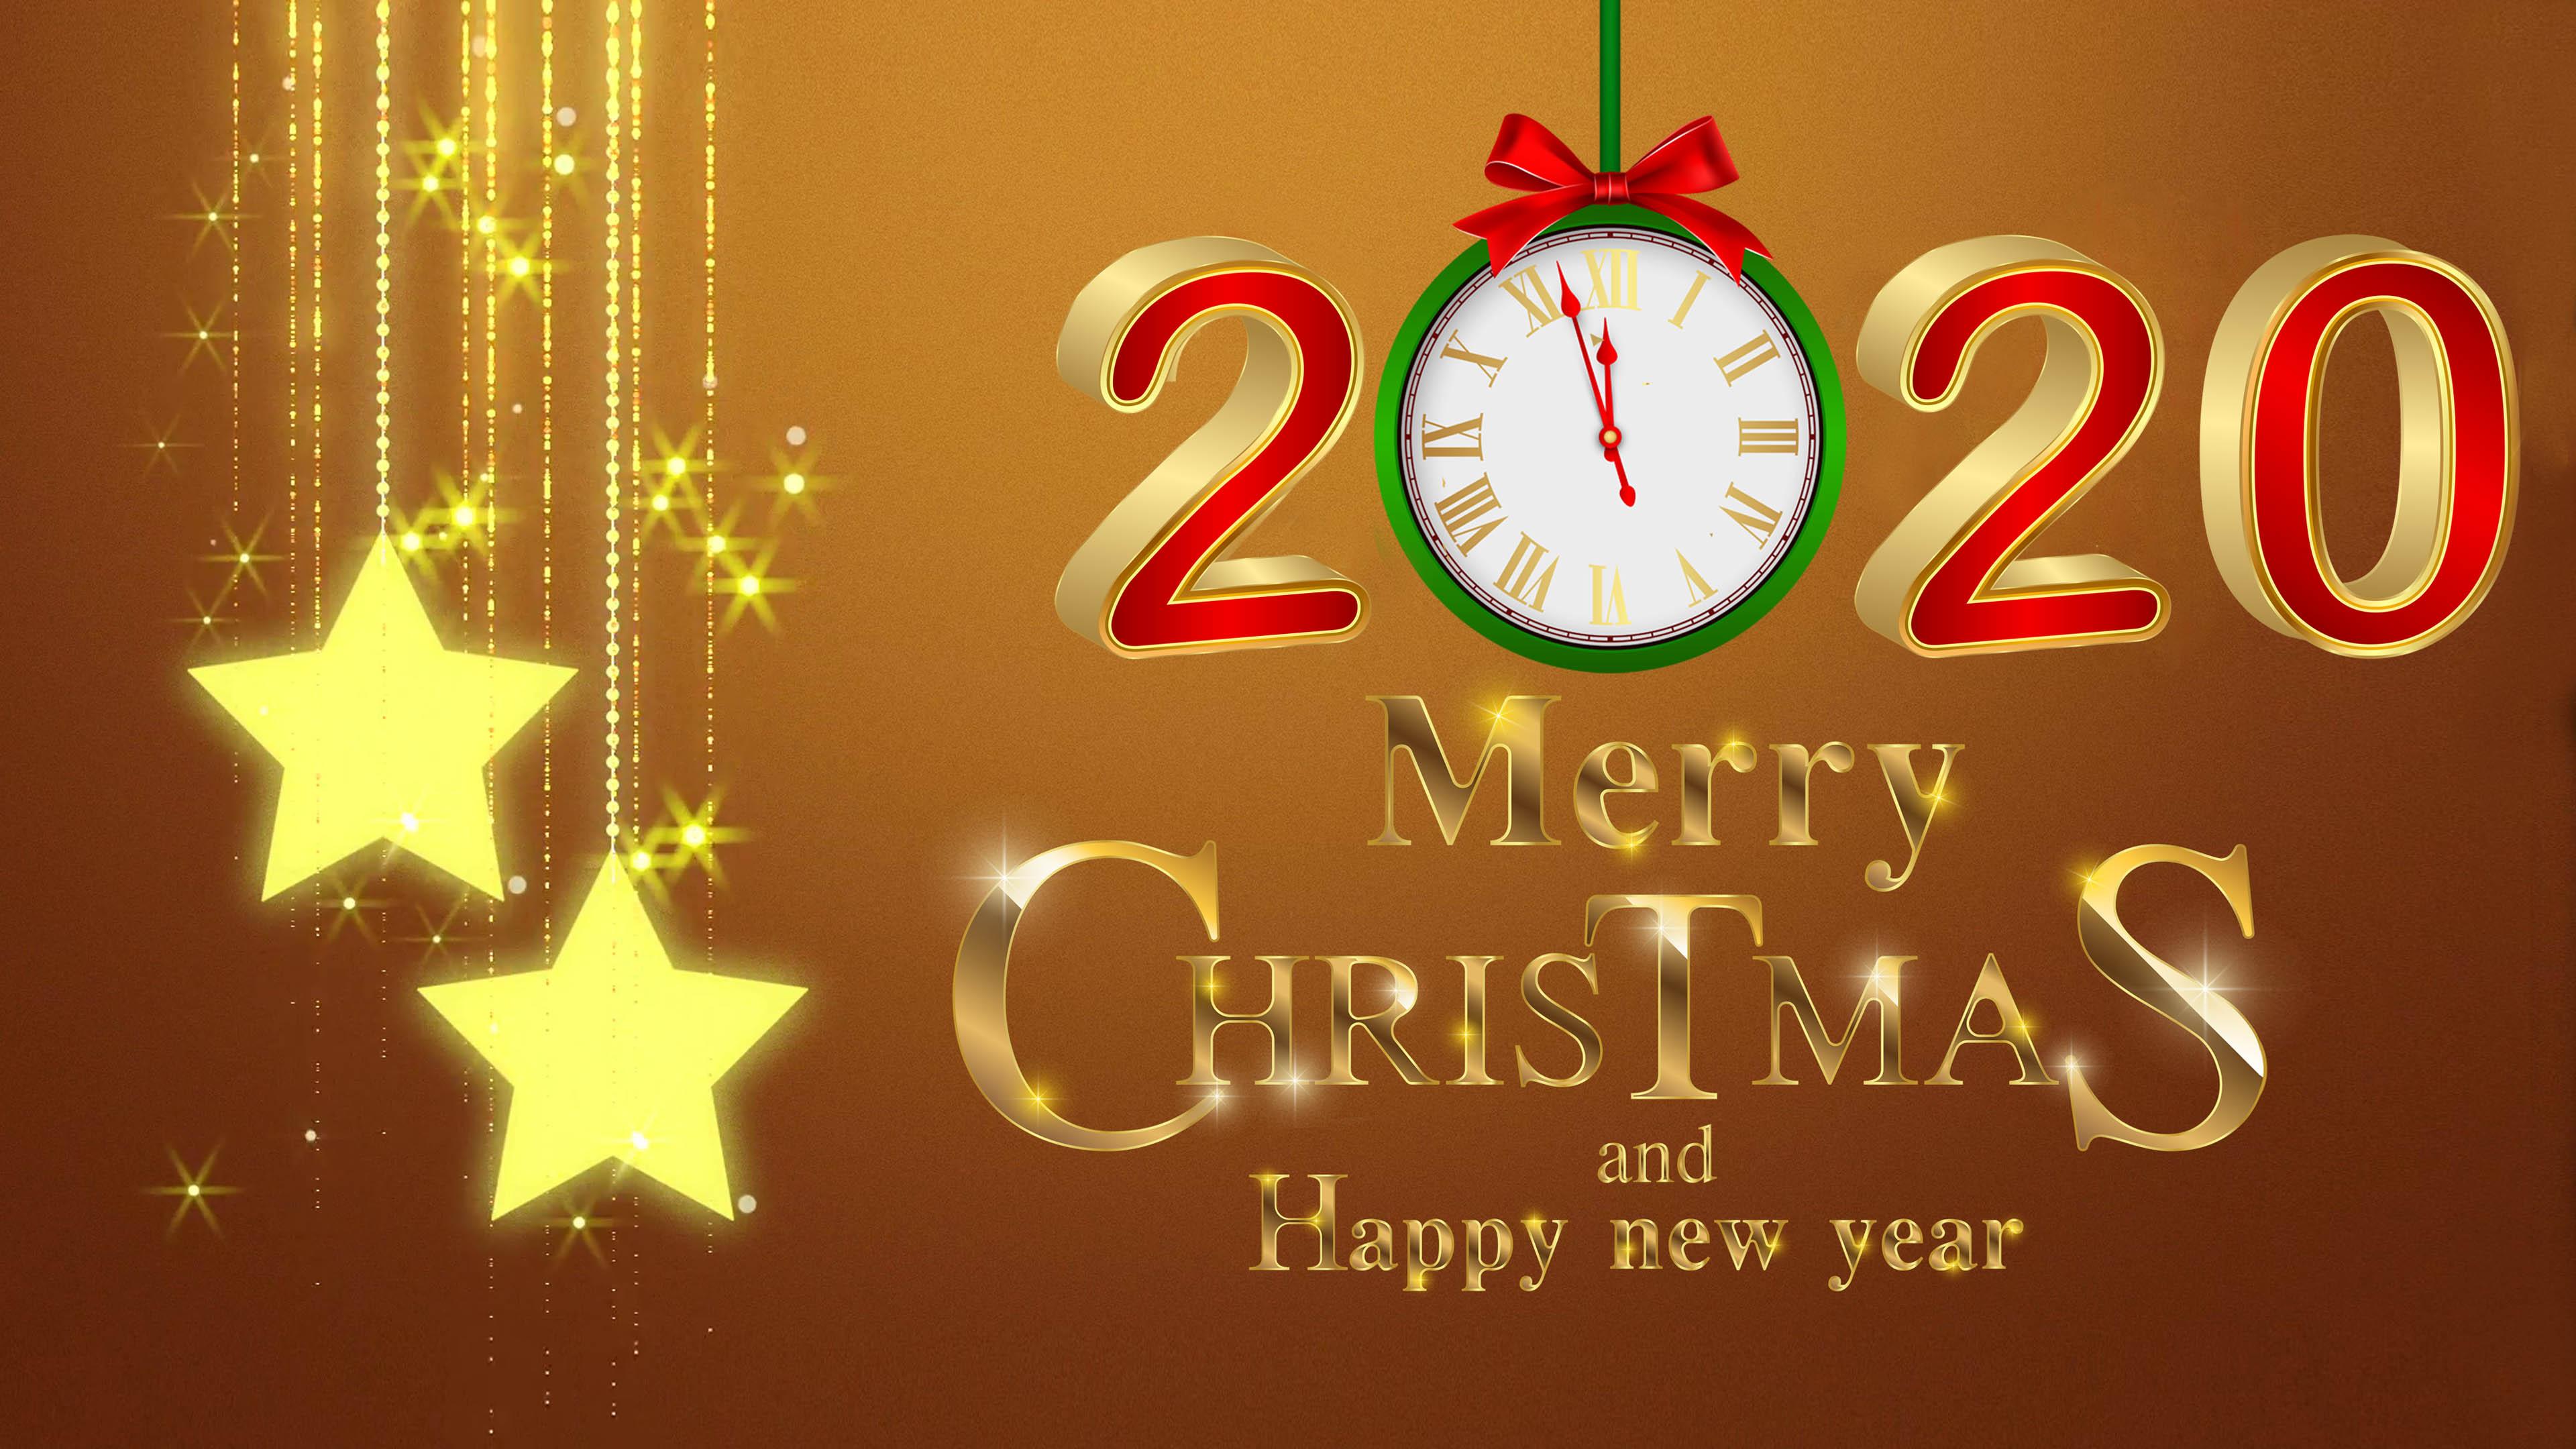 36] Happy New Year 2020 Hd Mobile Wallpapers on WallpaperSafari 3840x2160